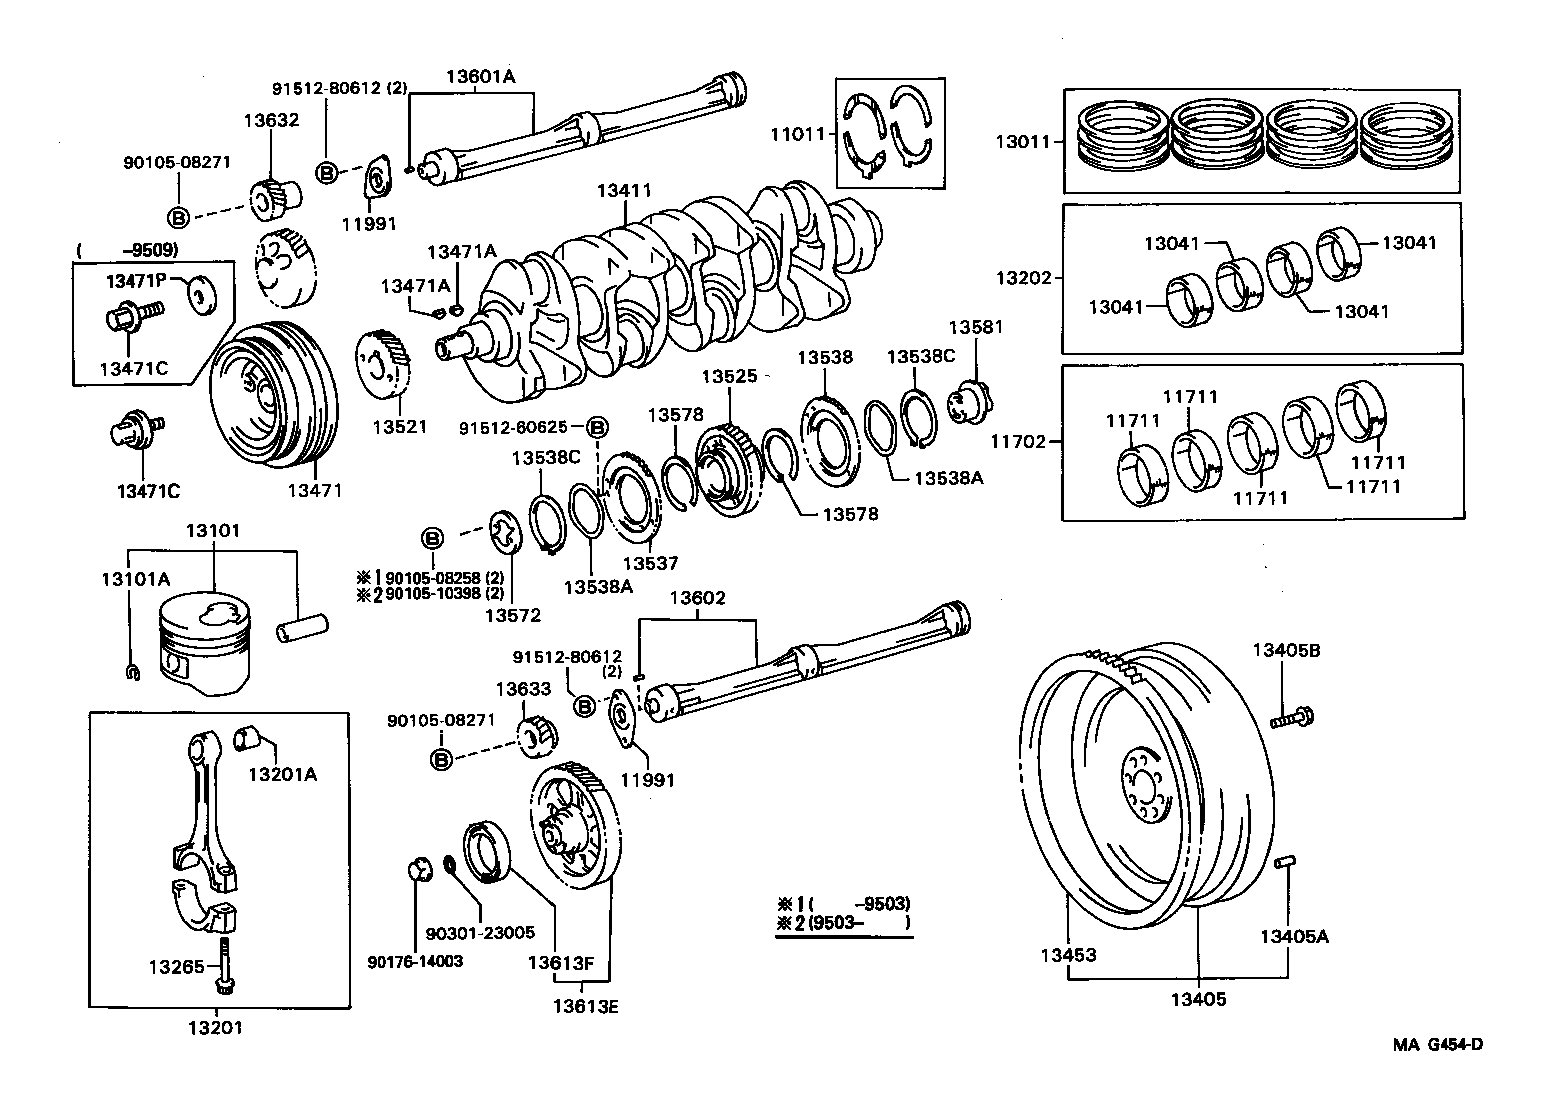 Car Alarm Wiring Diagram Besides 1985 Toyota Pickup 22r Engine Diagram